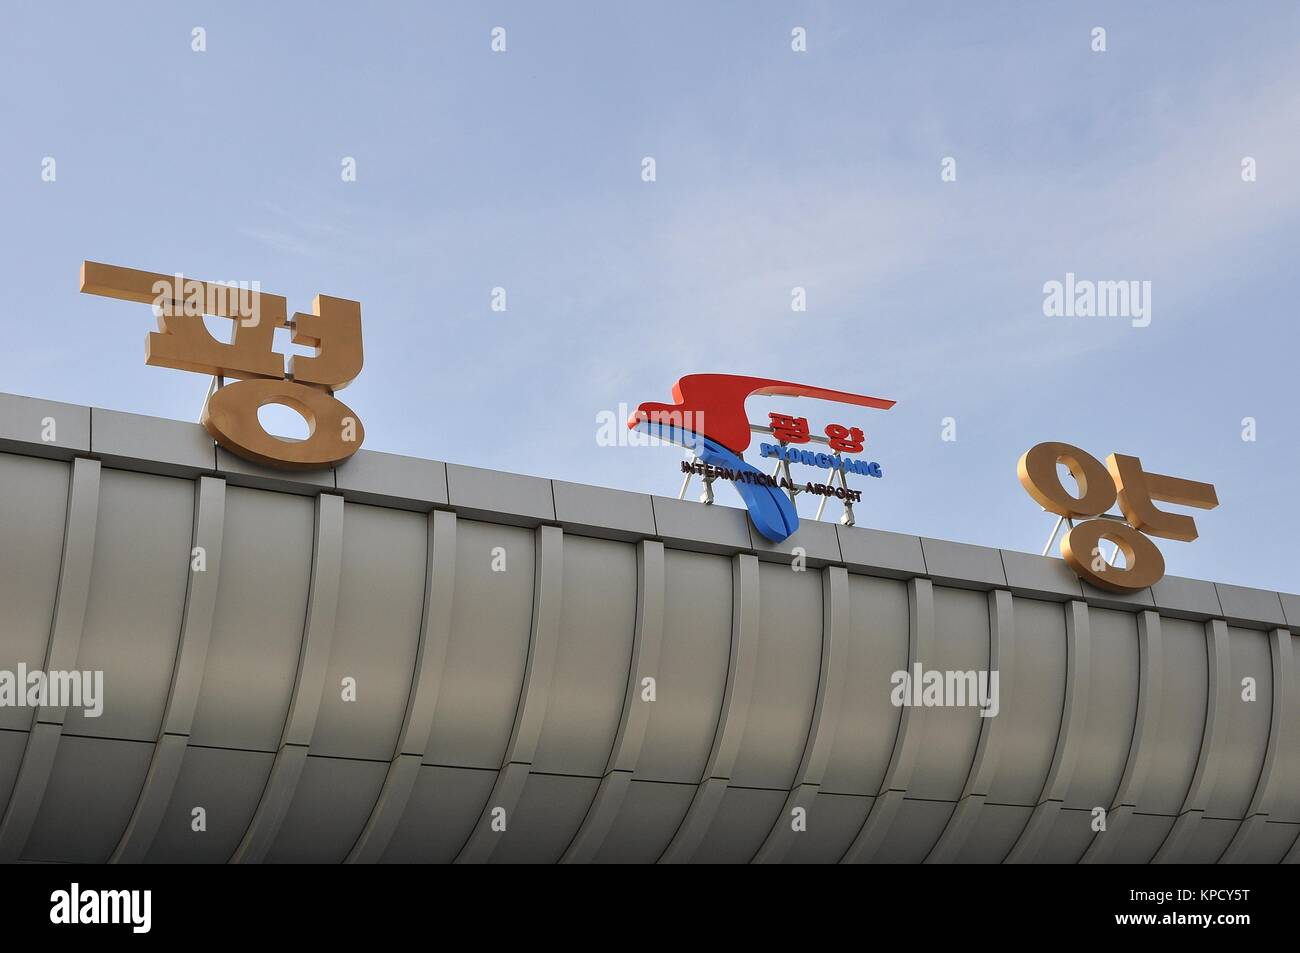 SIGNAGE AT PYONGYANG'S SUNAN INTERNATIONAL AIRPORT.. - Stock Image